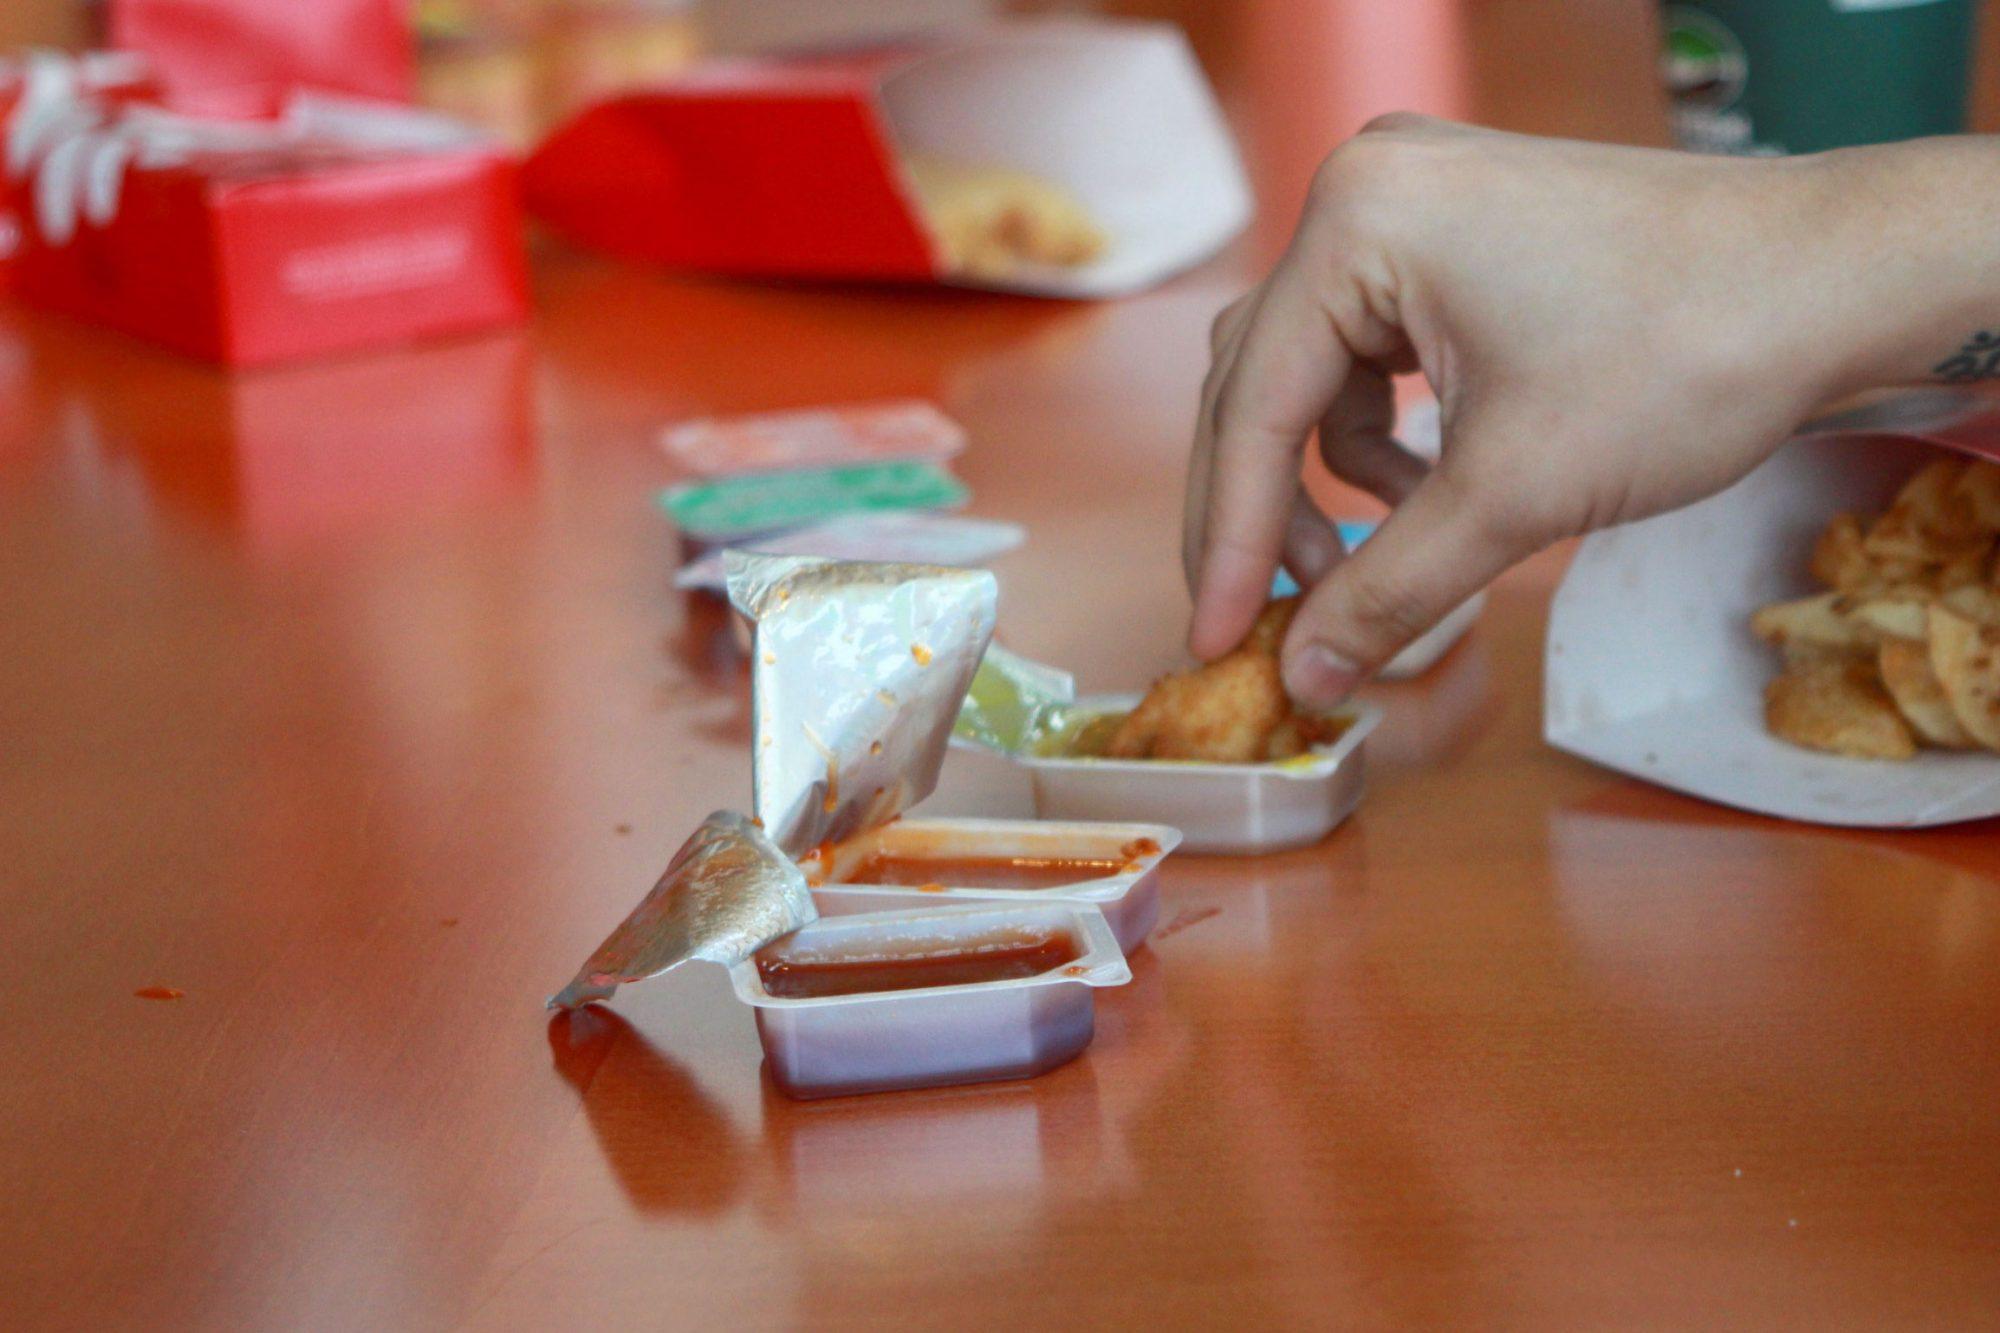 chick-fil-a sauce inline